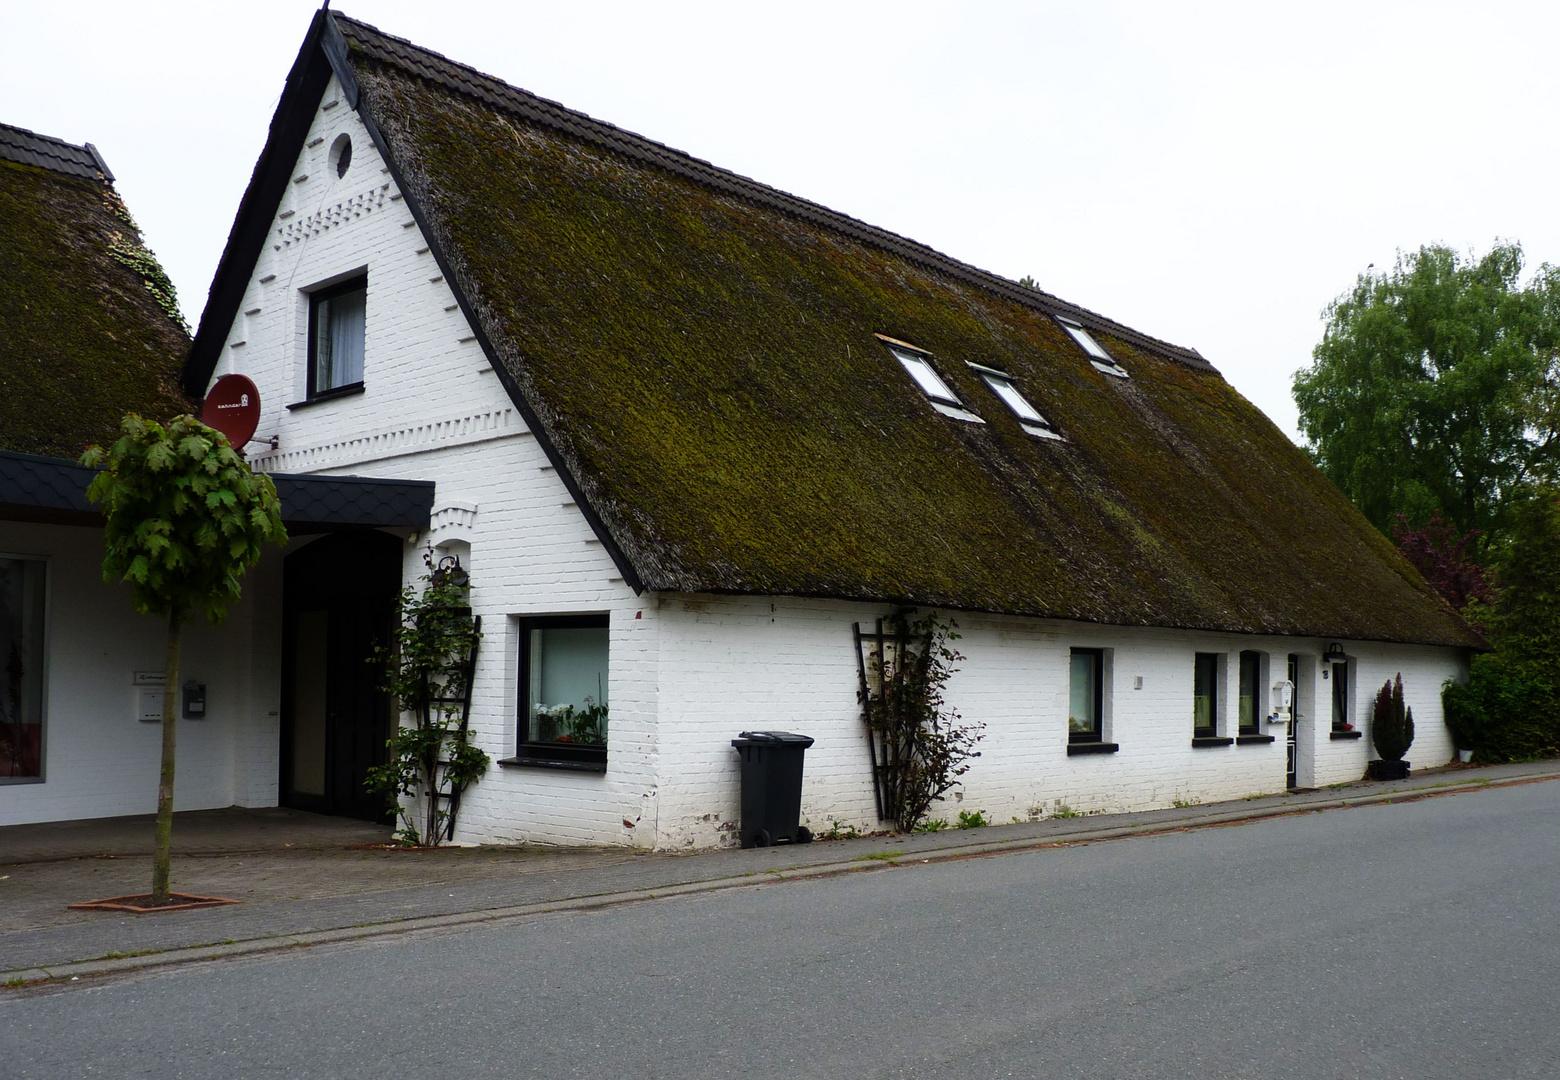 Reetdachhaus in Hüde